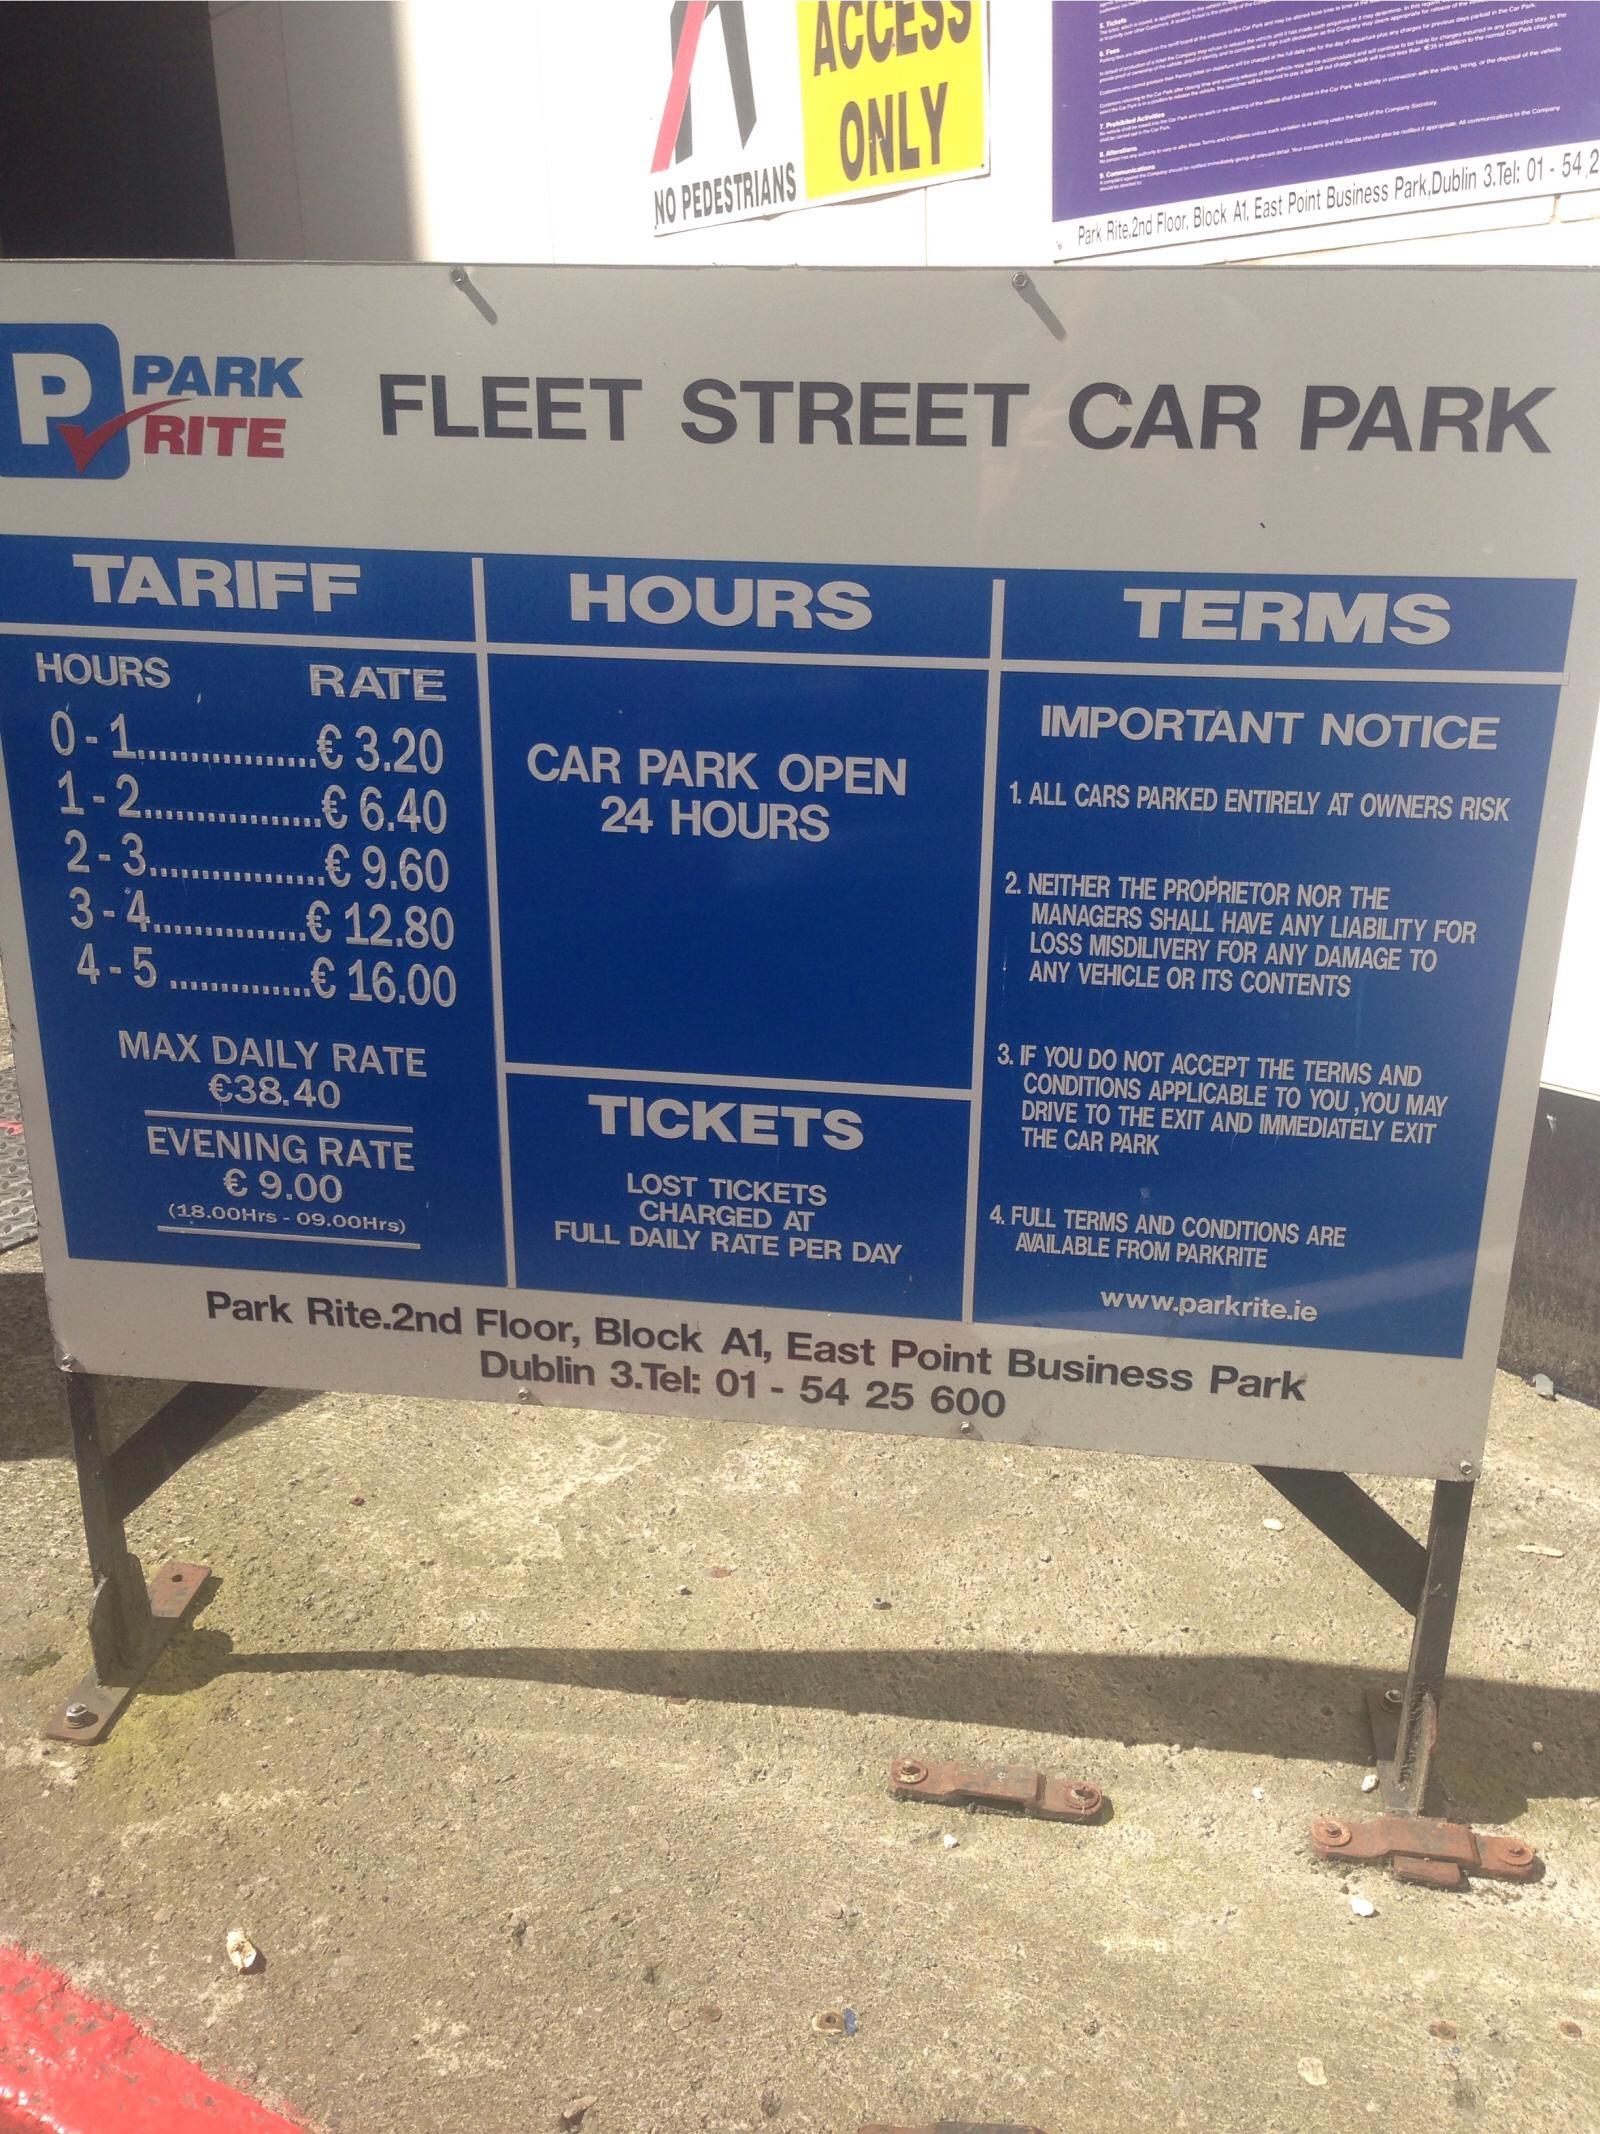 Fleet Street Car Park Dublin